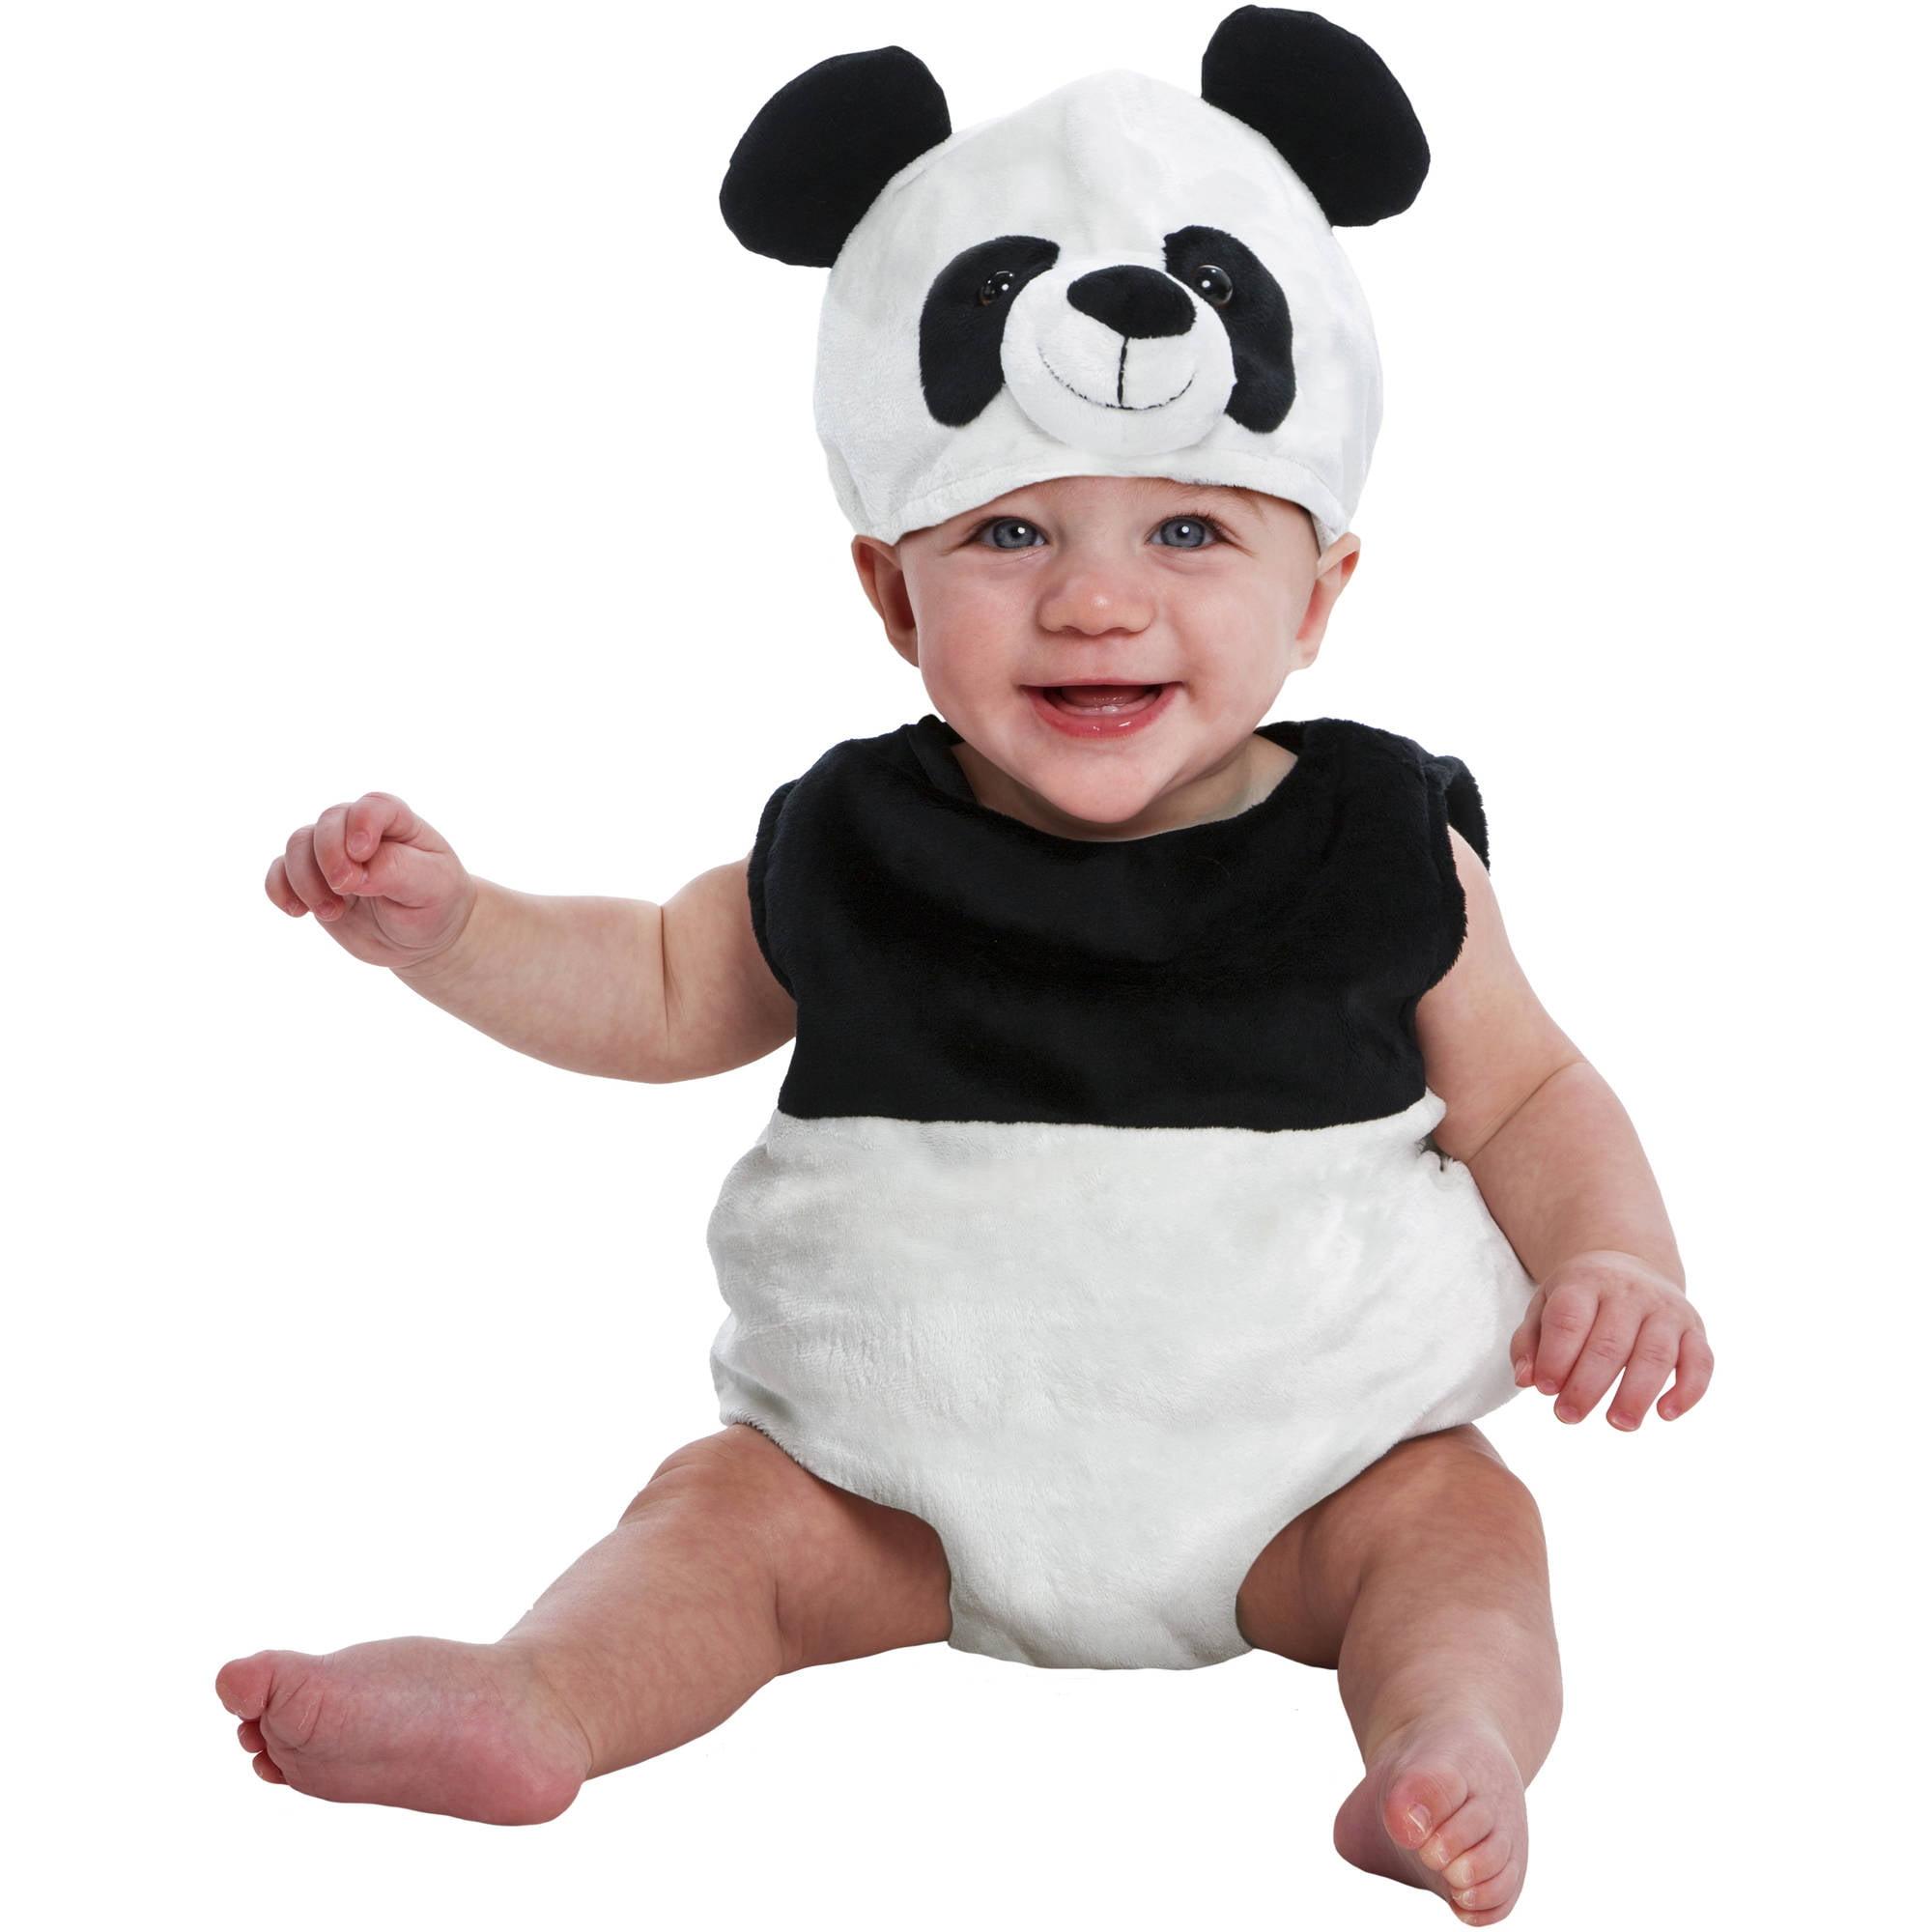 sc 1 st  Walmart.com & Panda Bubble Infant Halloween Dress Up / Role Play Costume - Walmart.com